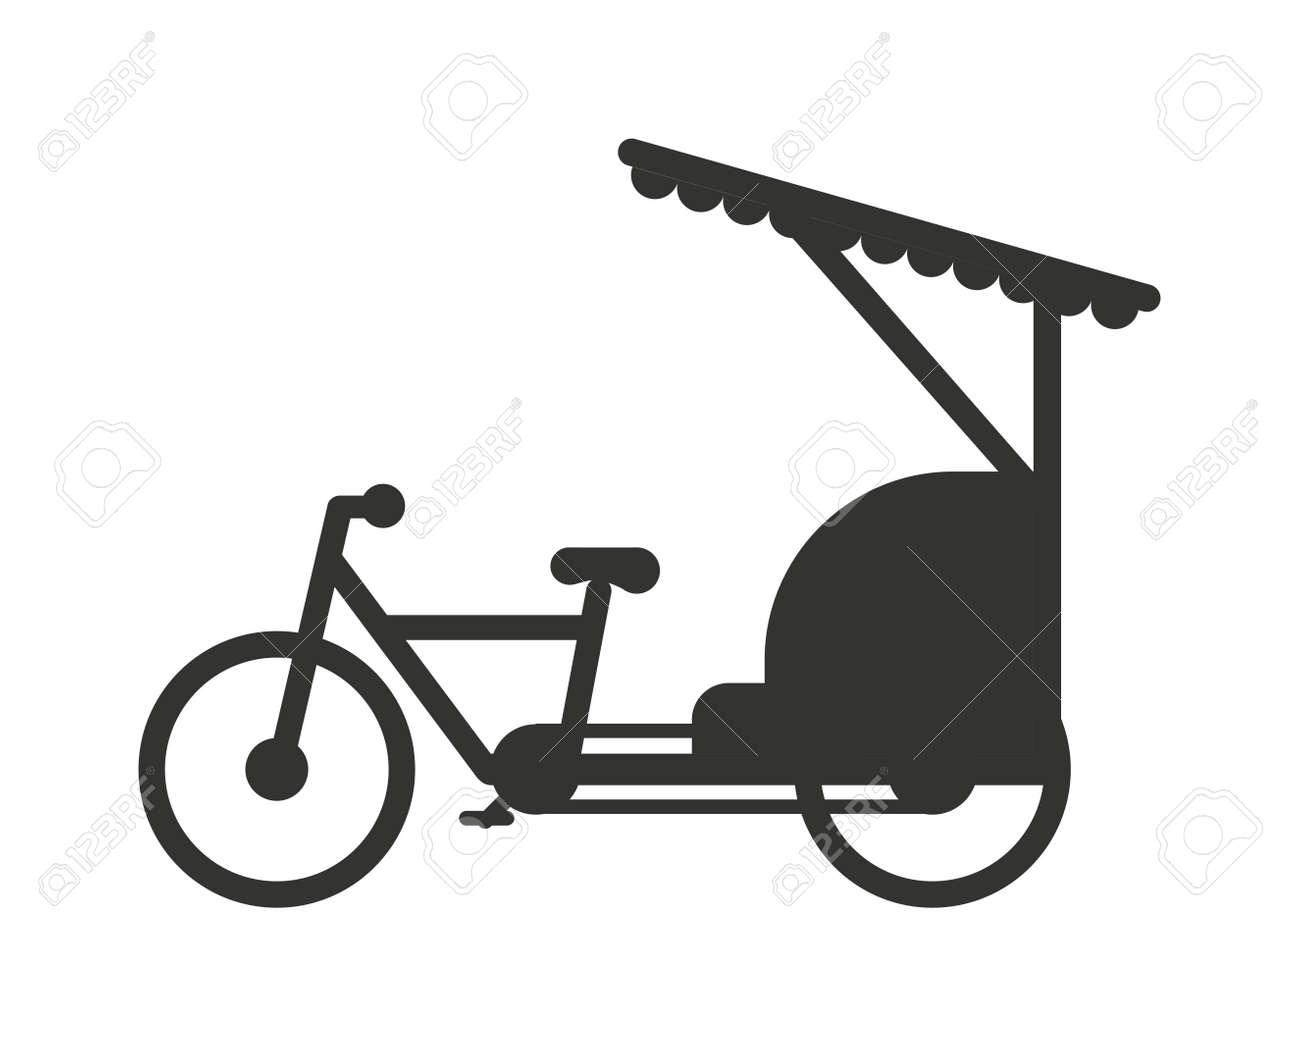 Pedicab Cliparts, Stock Vector And Royalty Free Pedicab Illustrations